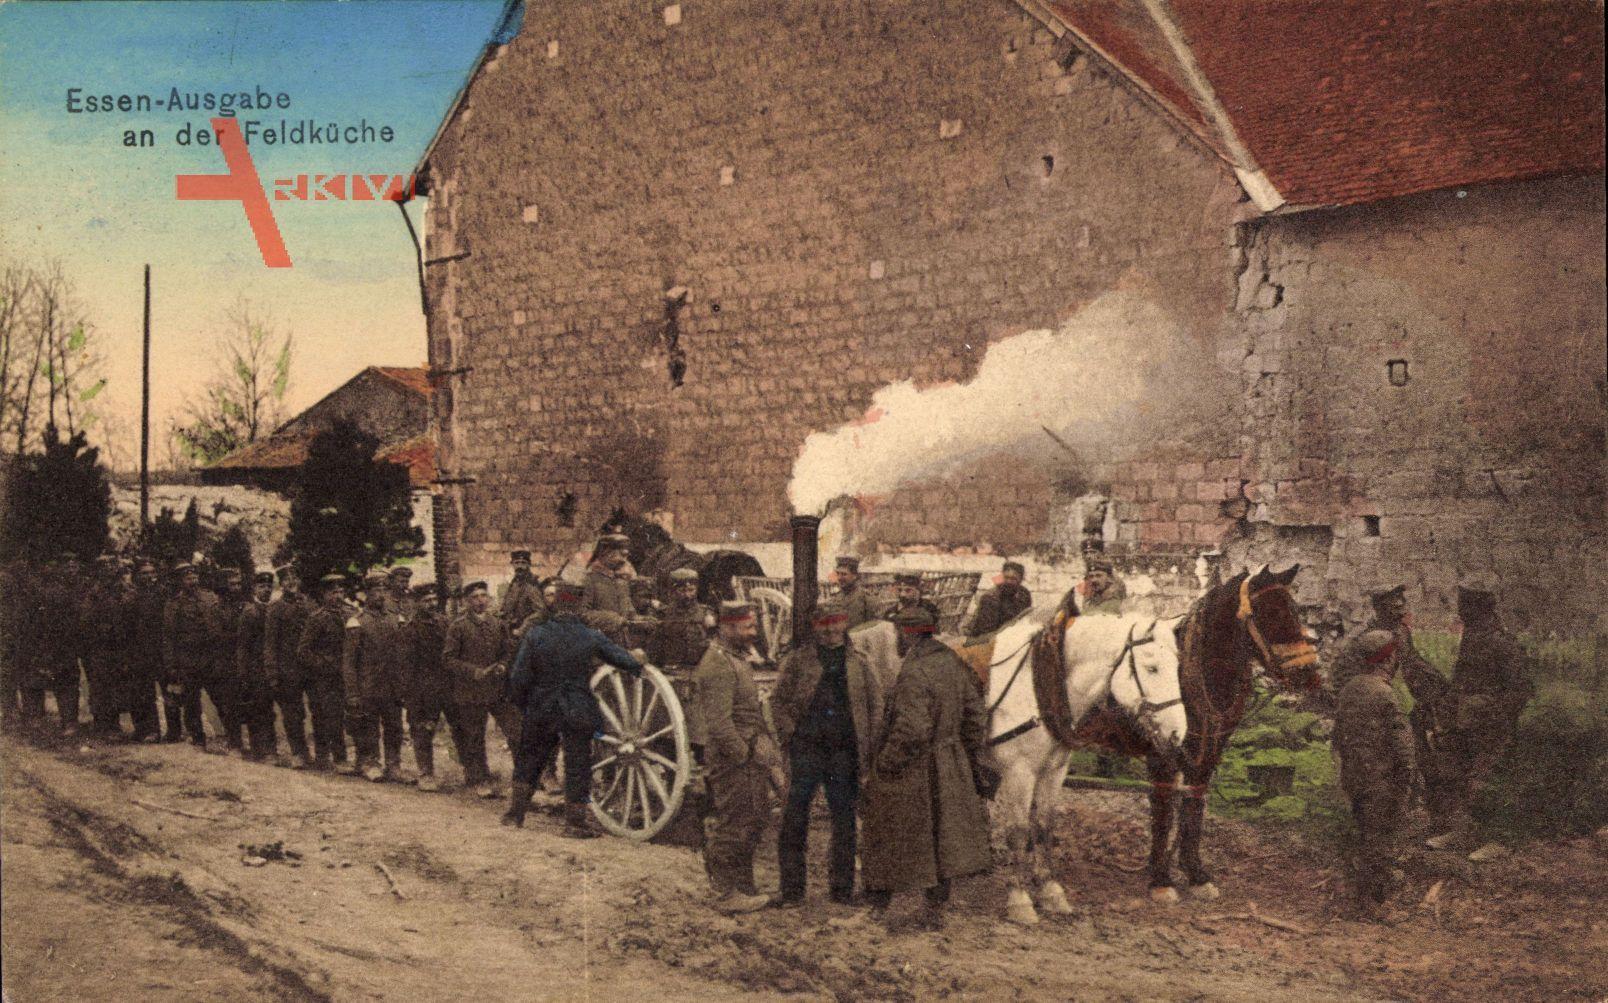 Essensausgabe an der Feldküche, Erster Weltkrieg, Pferdewagen